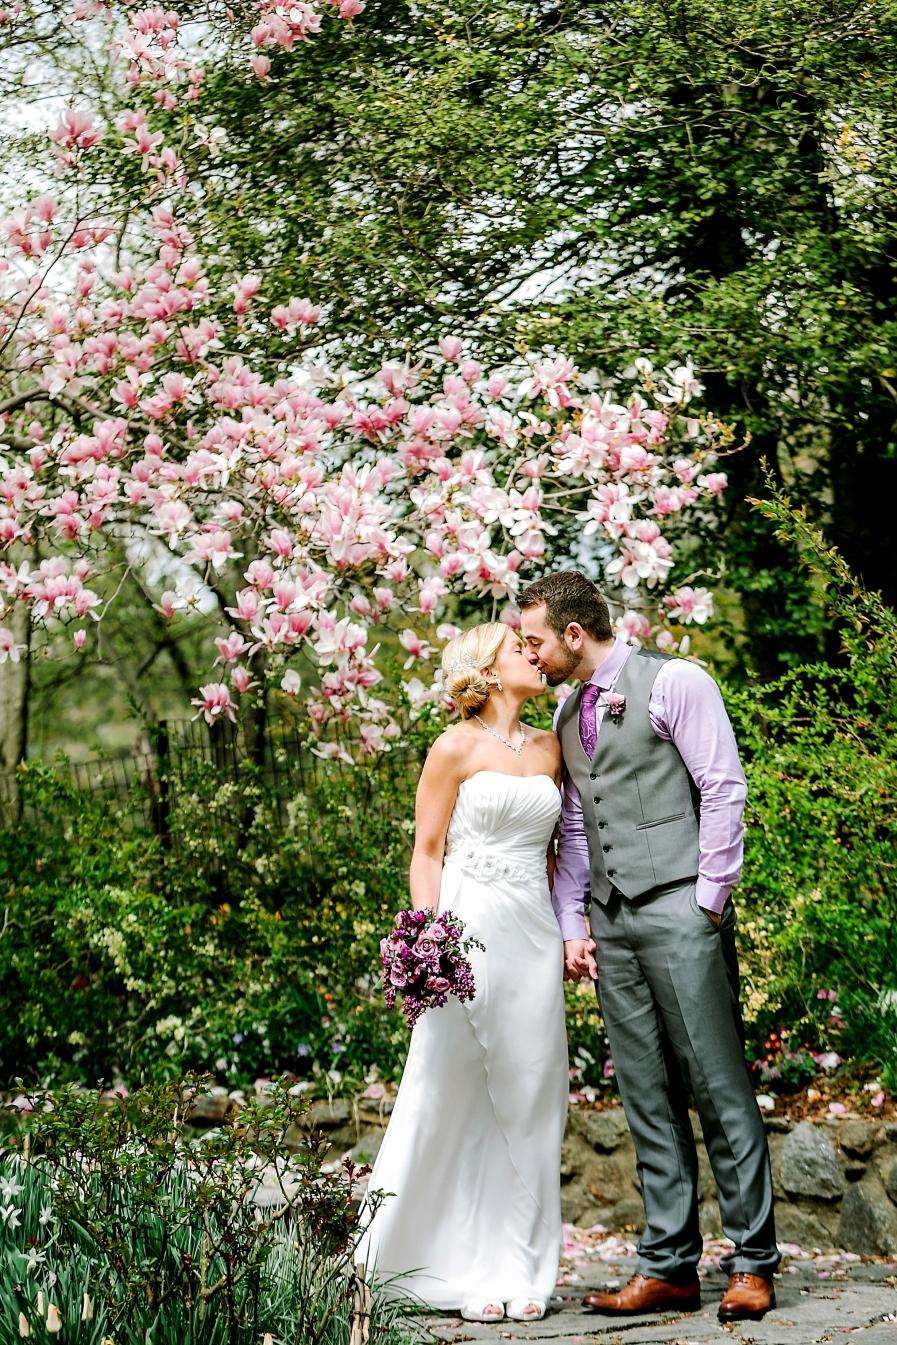 JS_centralpark_wedding-174